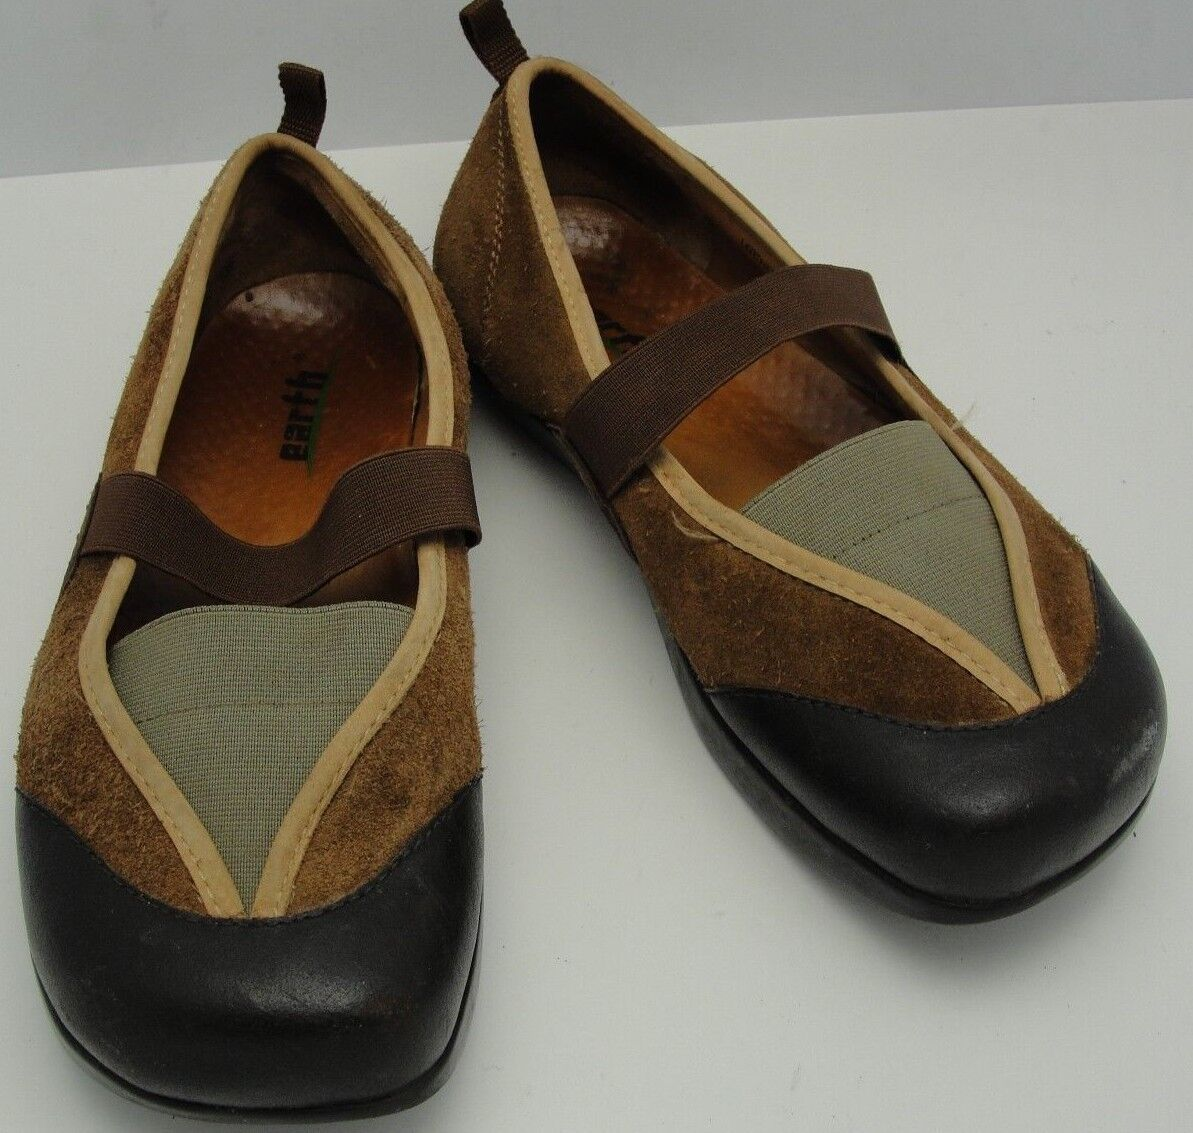 EARTH Intrique Moss Tan Tan Tan marrón Leather Mary Jane Walking Casual zapatos Talla 7.B  comprar marca